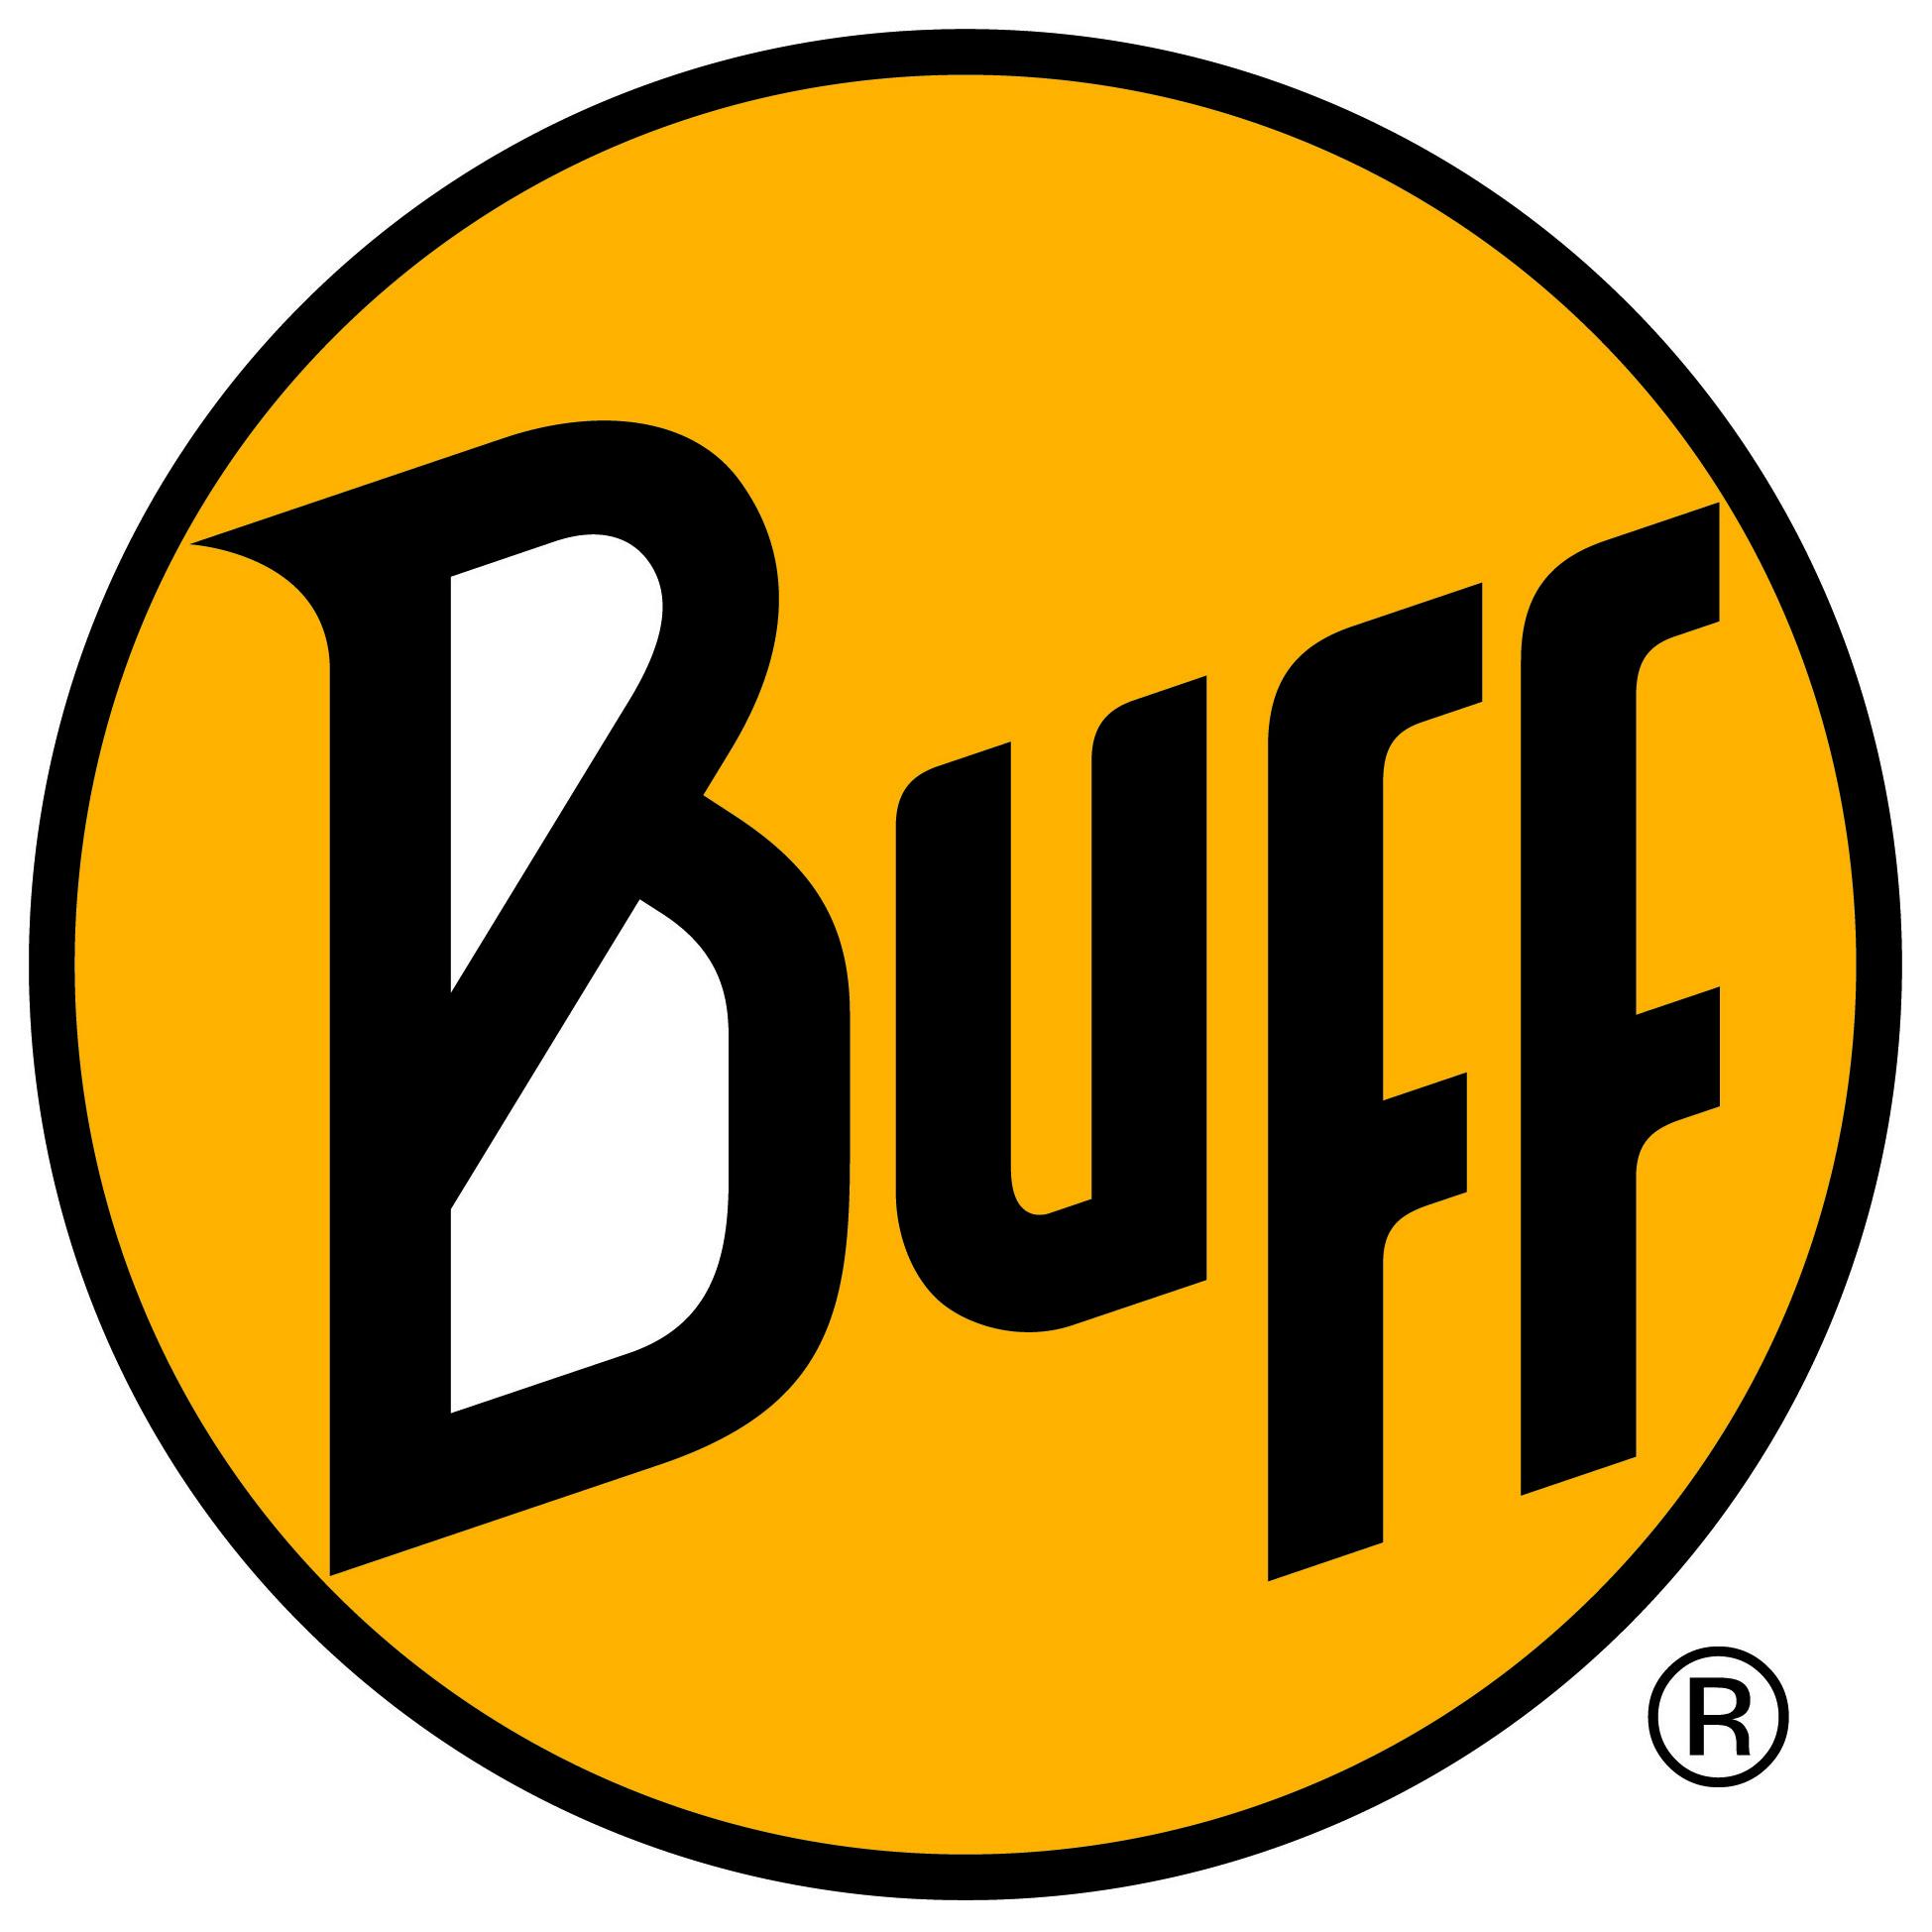 BUFF¬ logo for Sports line CMYK.jpg